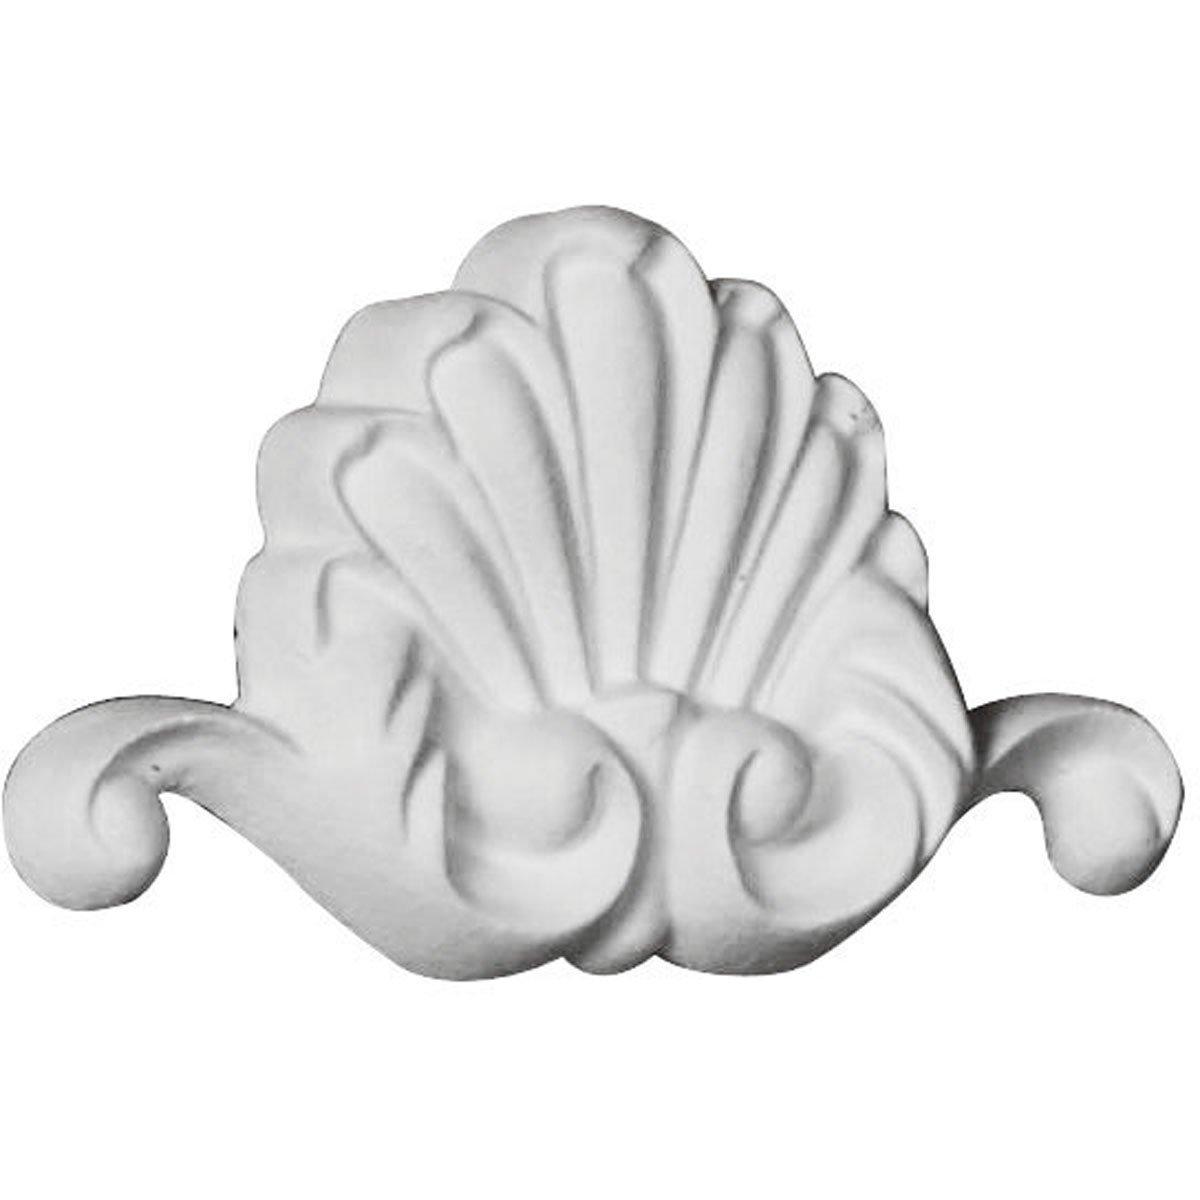 Ekena Millwork ONL03X02X00BO 3''W x 1 3/4''H x 3/8''P Bordeaux Shell Onlay White by Ekena Millwork (Image #2)